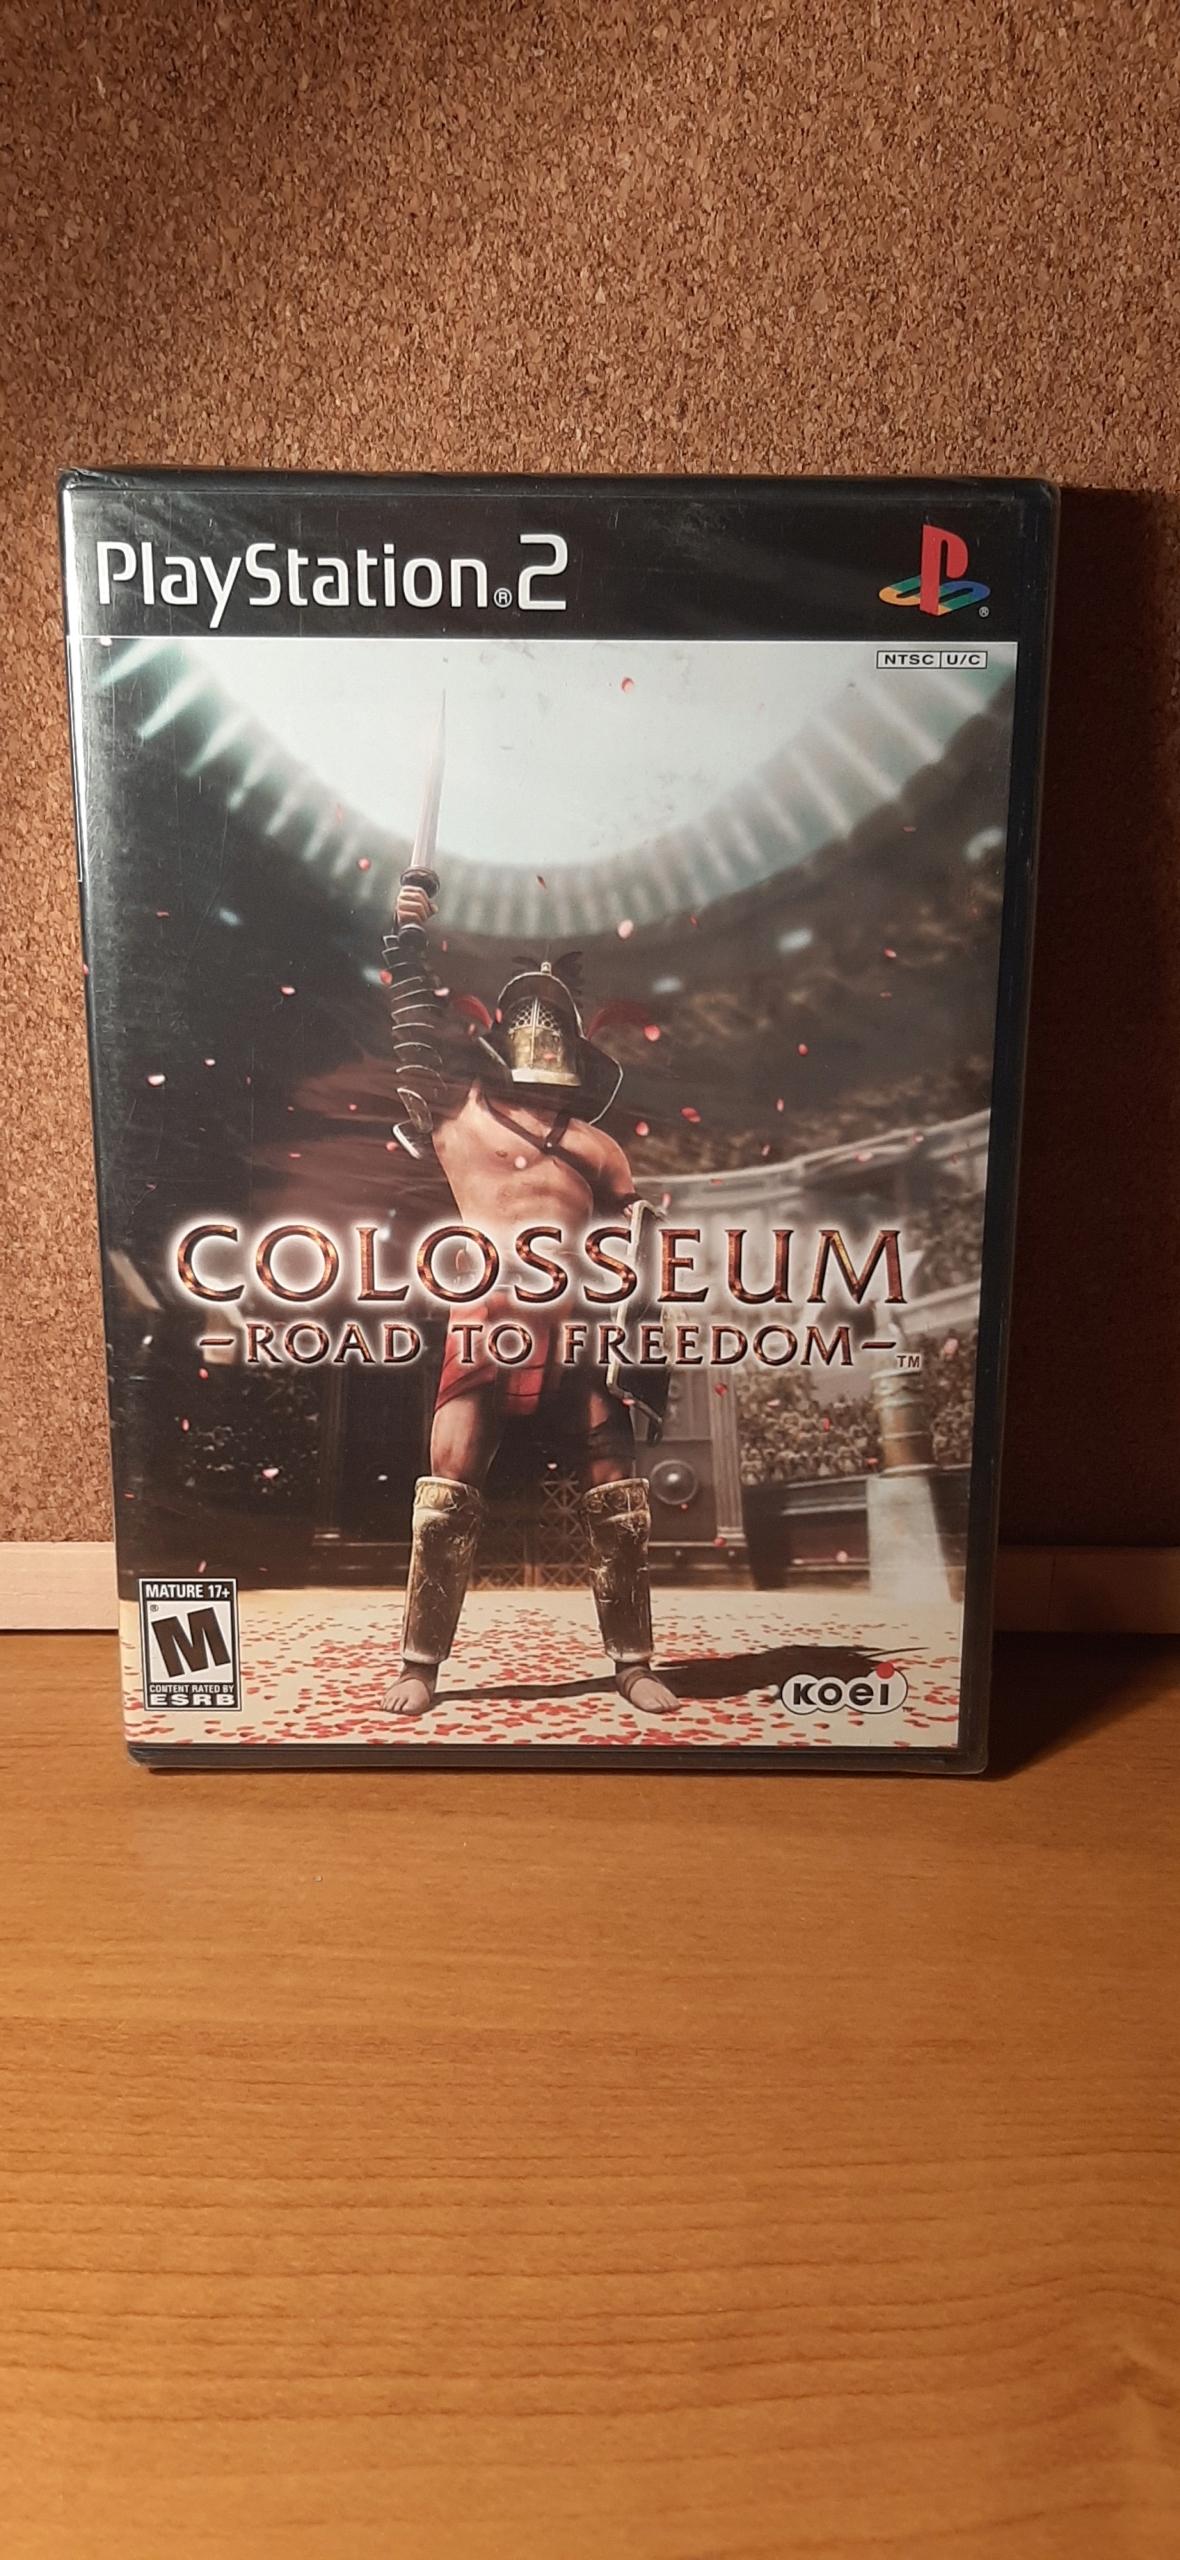 Coloseum Cesta za slobodou PS2 NTSC / U retro klasika